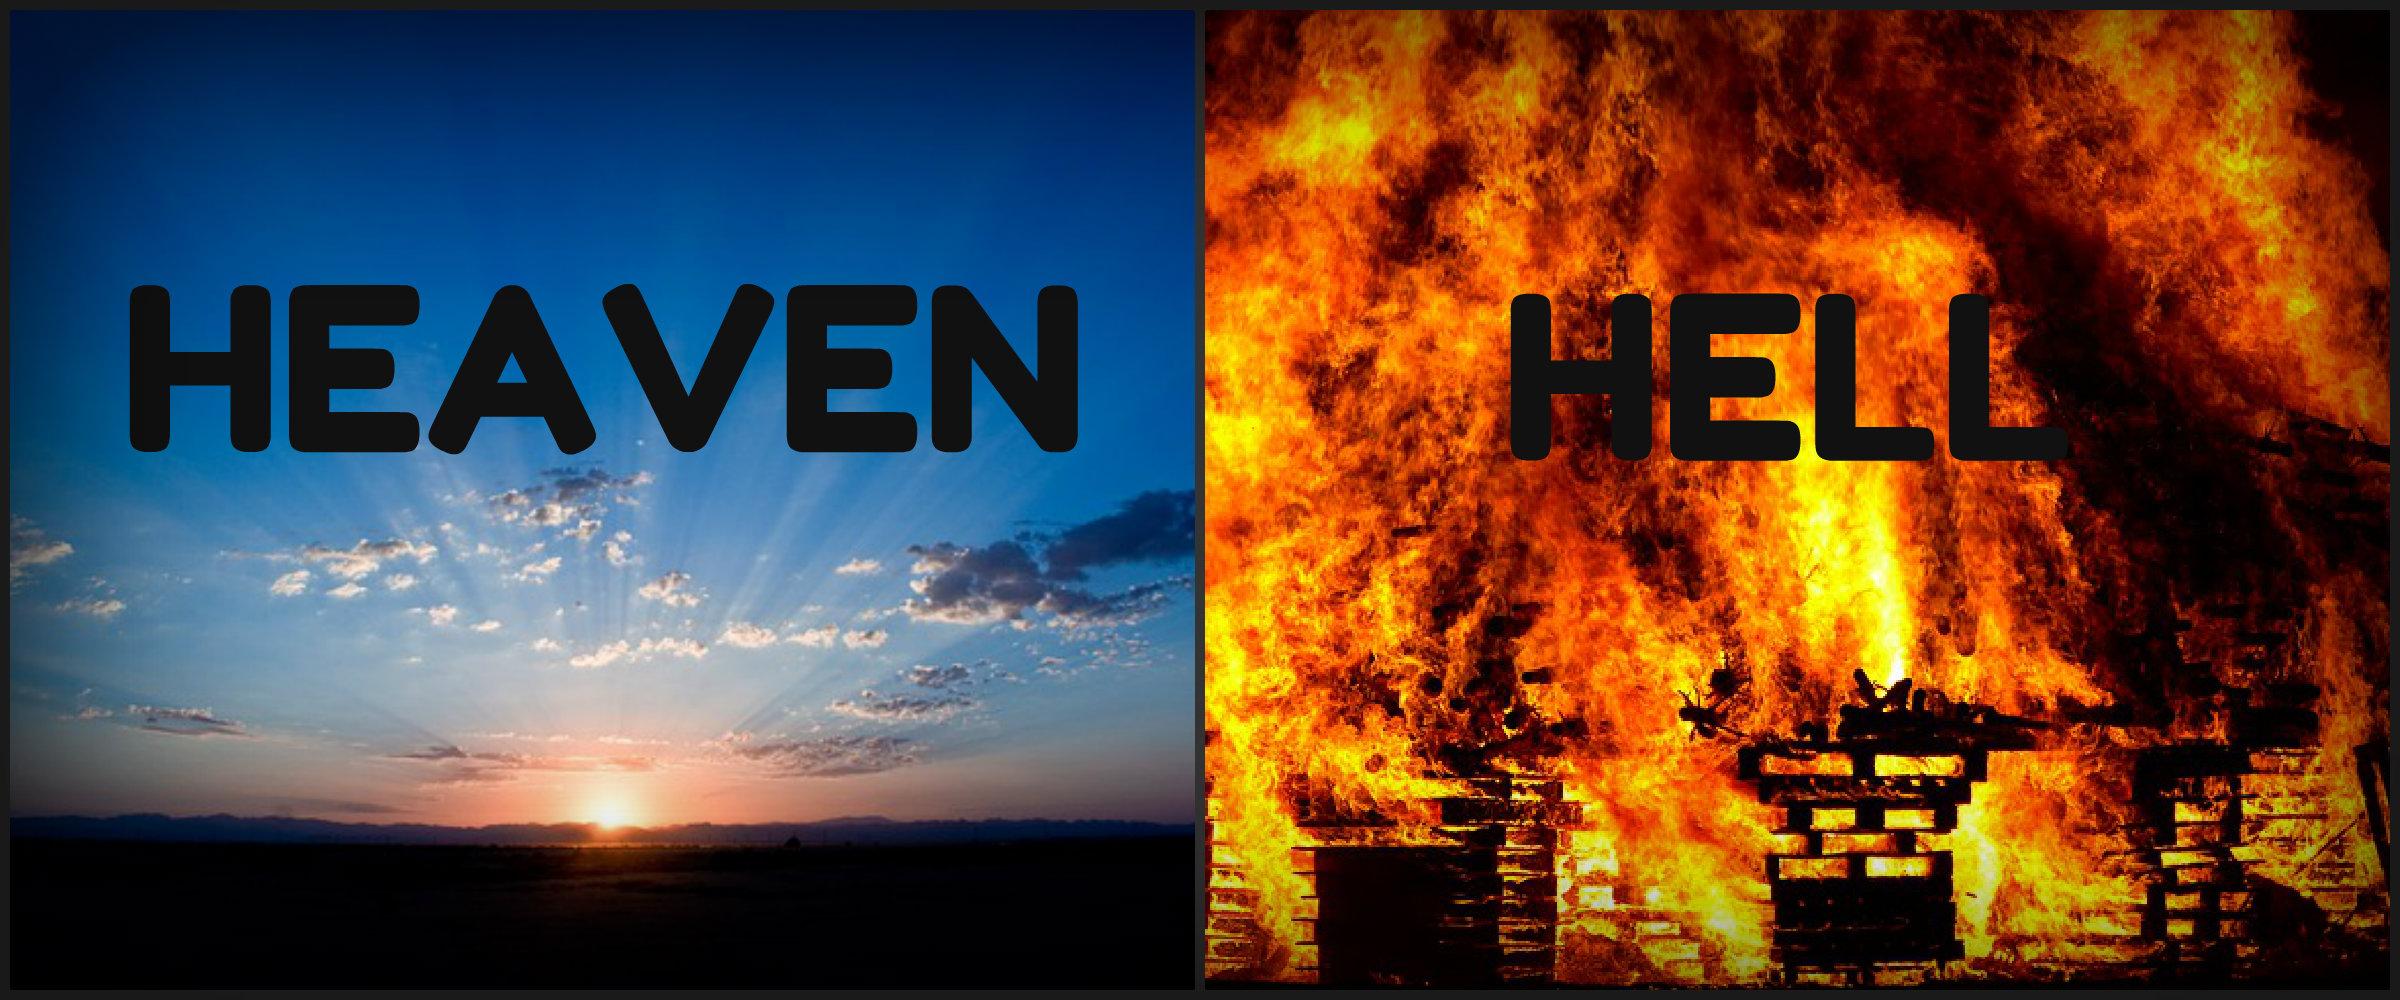 https://jessedooley.wordpress.com/2015/01/28/heaven-is-for-real-so-is-hell-metaphorically/